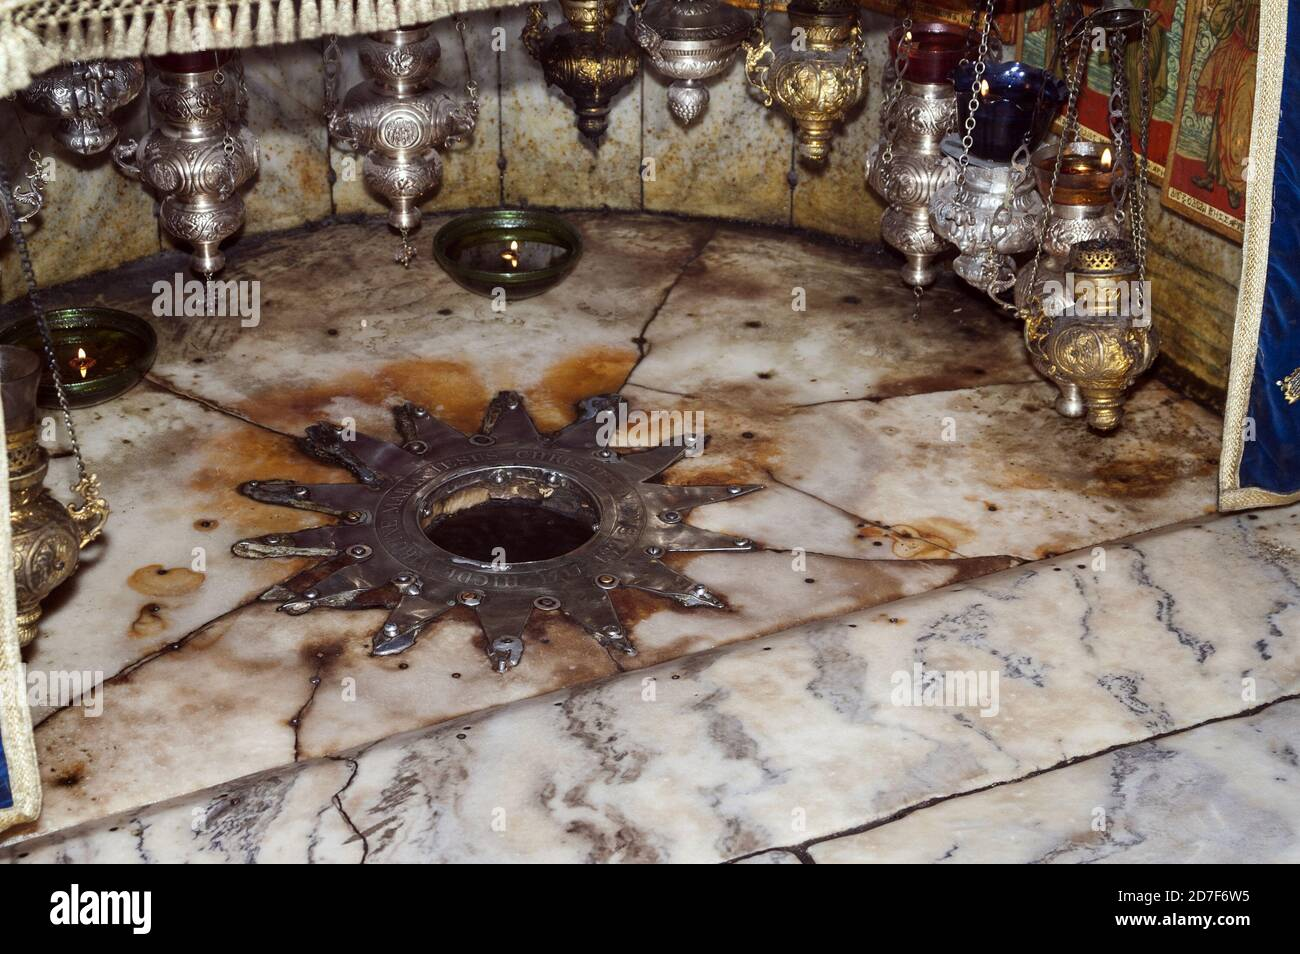 Bethlehem, בית לחם, Palestine, بيت لحم, Israel, Izrael, ישראל ,دولة فلسطين; Church of the Nativity Grotto of the Nativity; Basilica of the Nativity Stock Photo